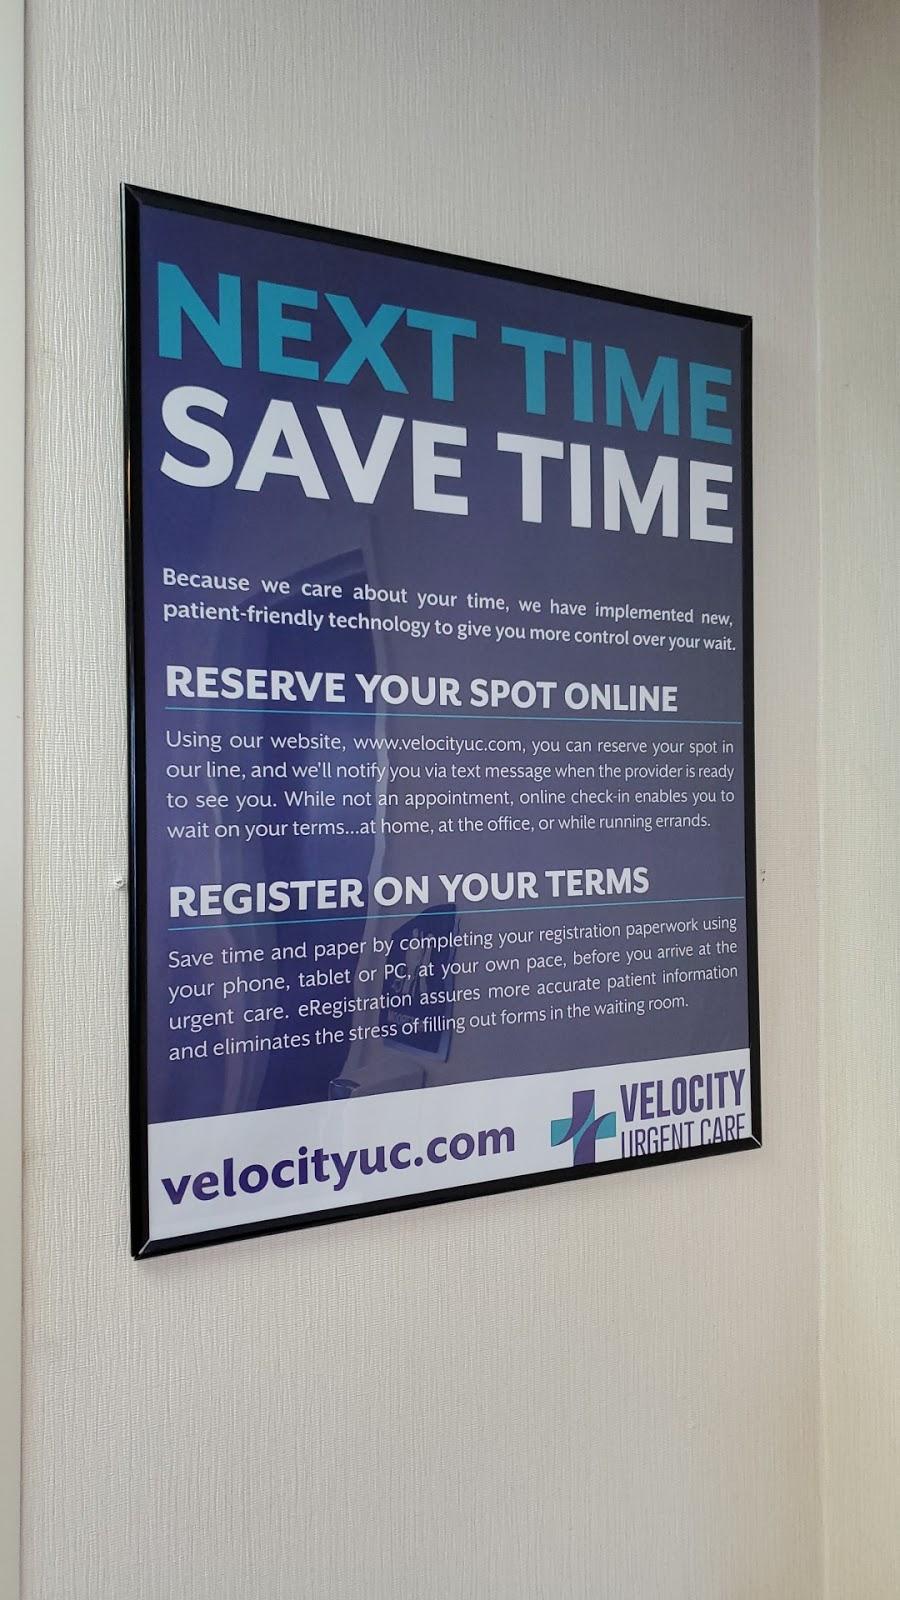 Velocity Urgent Care - doctor  | Photo 7 of 8 | Address: 2859 Virginia Beach Blvd Suite 100, Virginia Beach, VA 23452, USA | Phone: (757) 772-6123